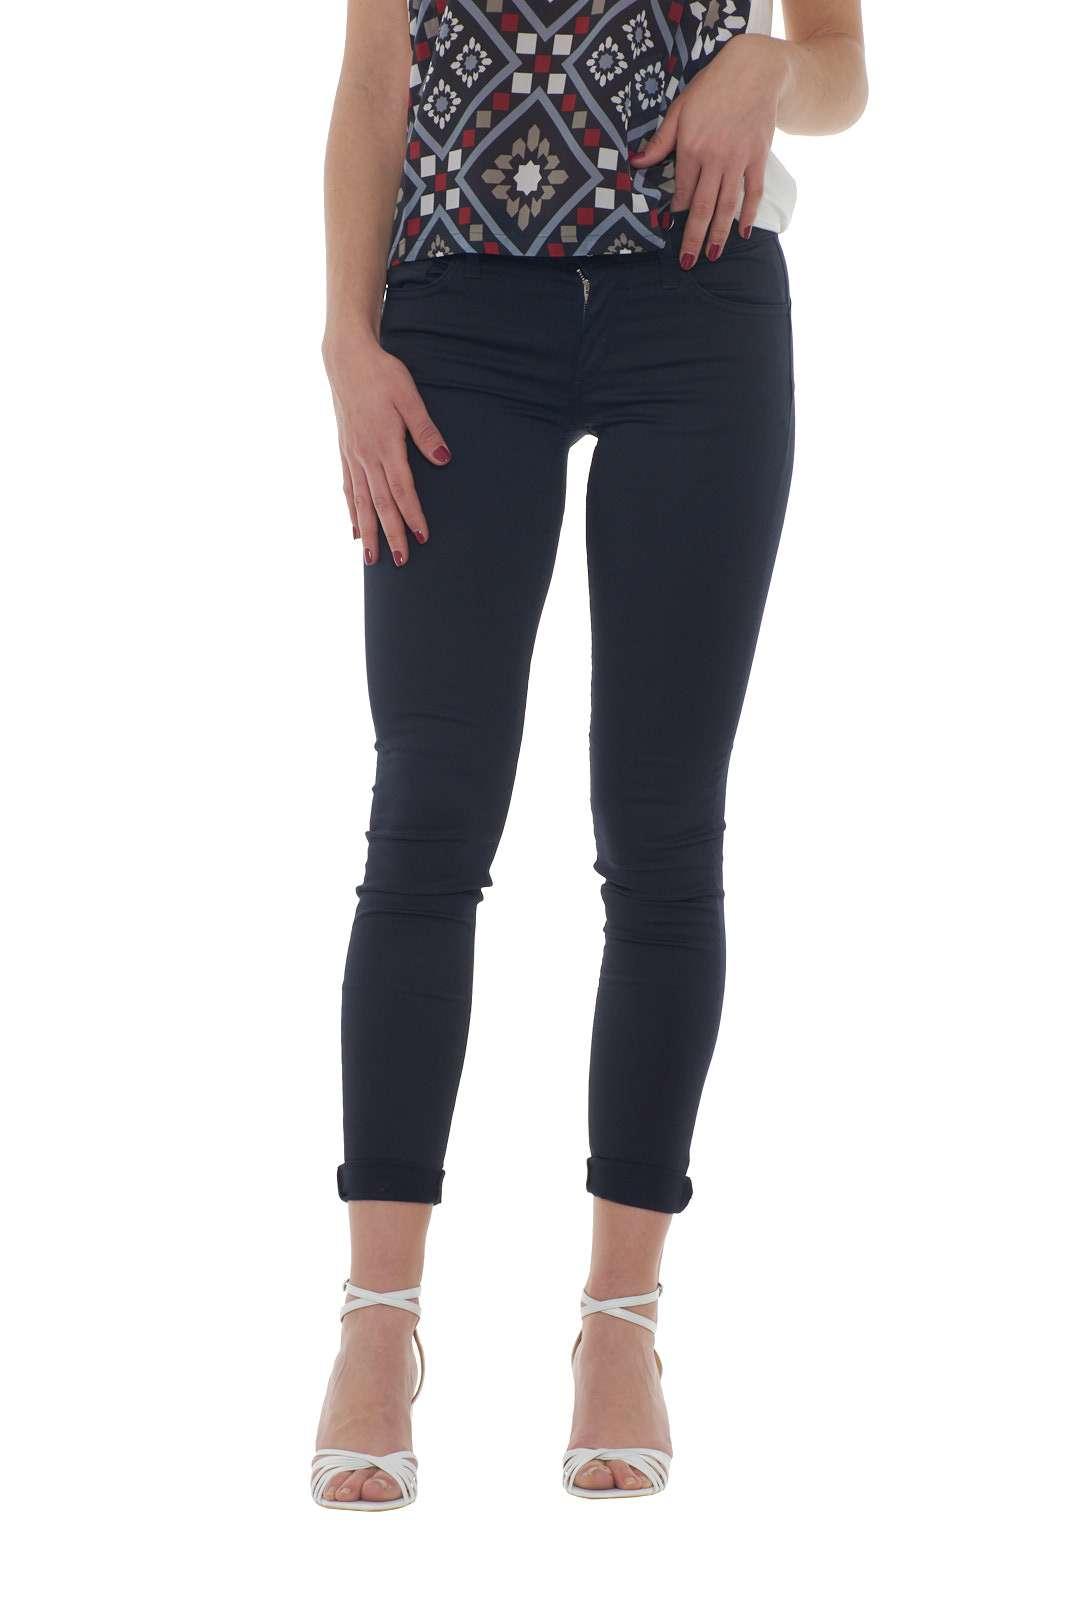 https://www.parmax.com/media/catalog/product/a/i/PE-outlet_parmax-pantaloni-donna-Liu-Jo-w17167-A.jpg